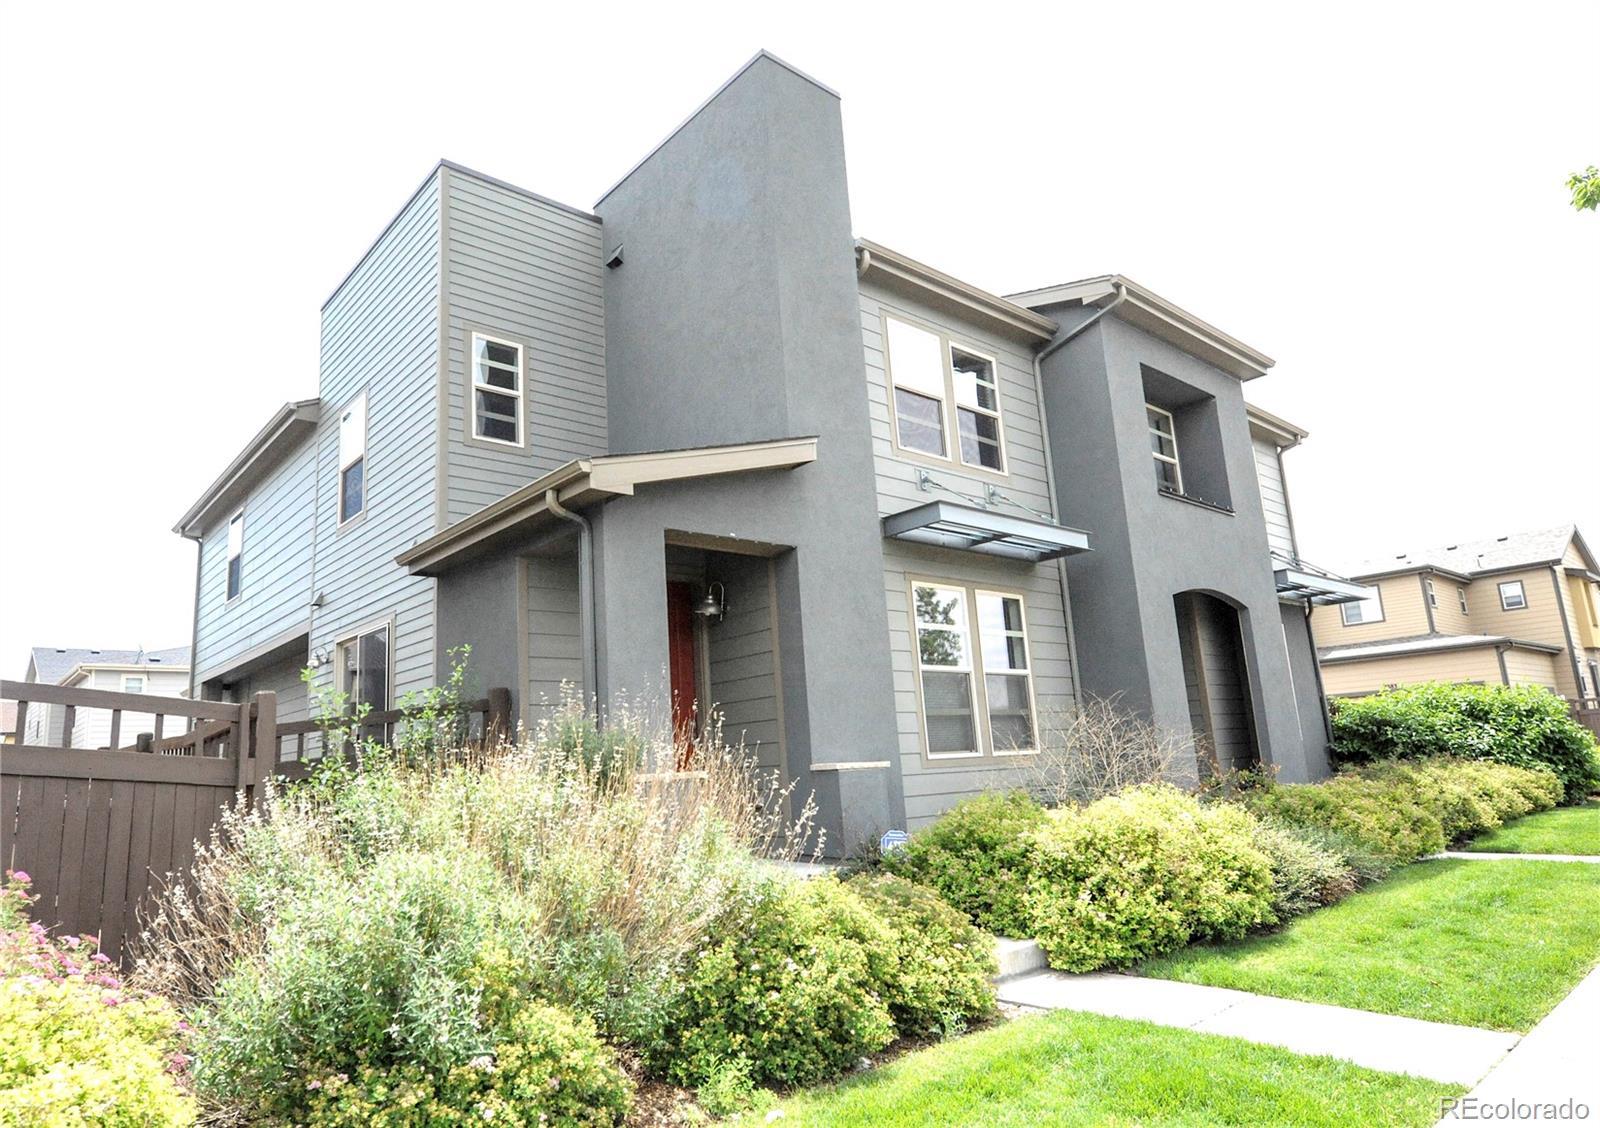 564 S Vance Street, Lakewood, CO 80226 - Lakewood, CO real estate listing